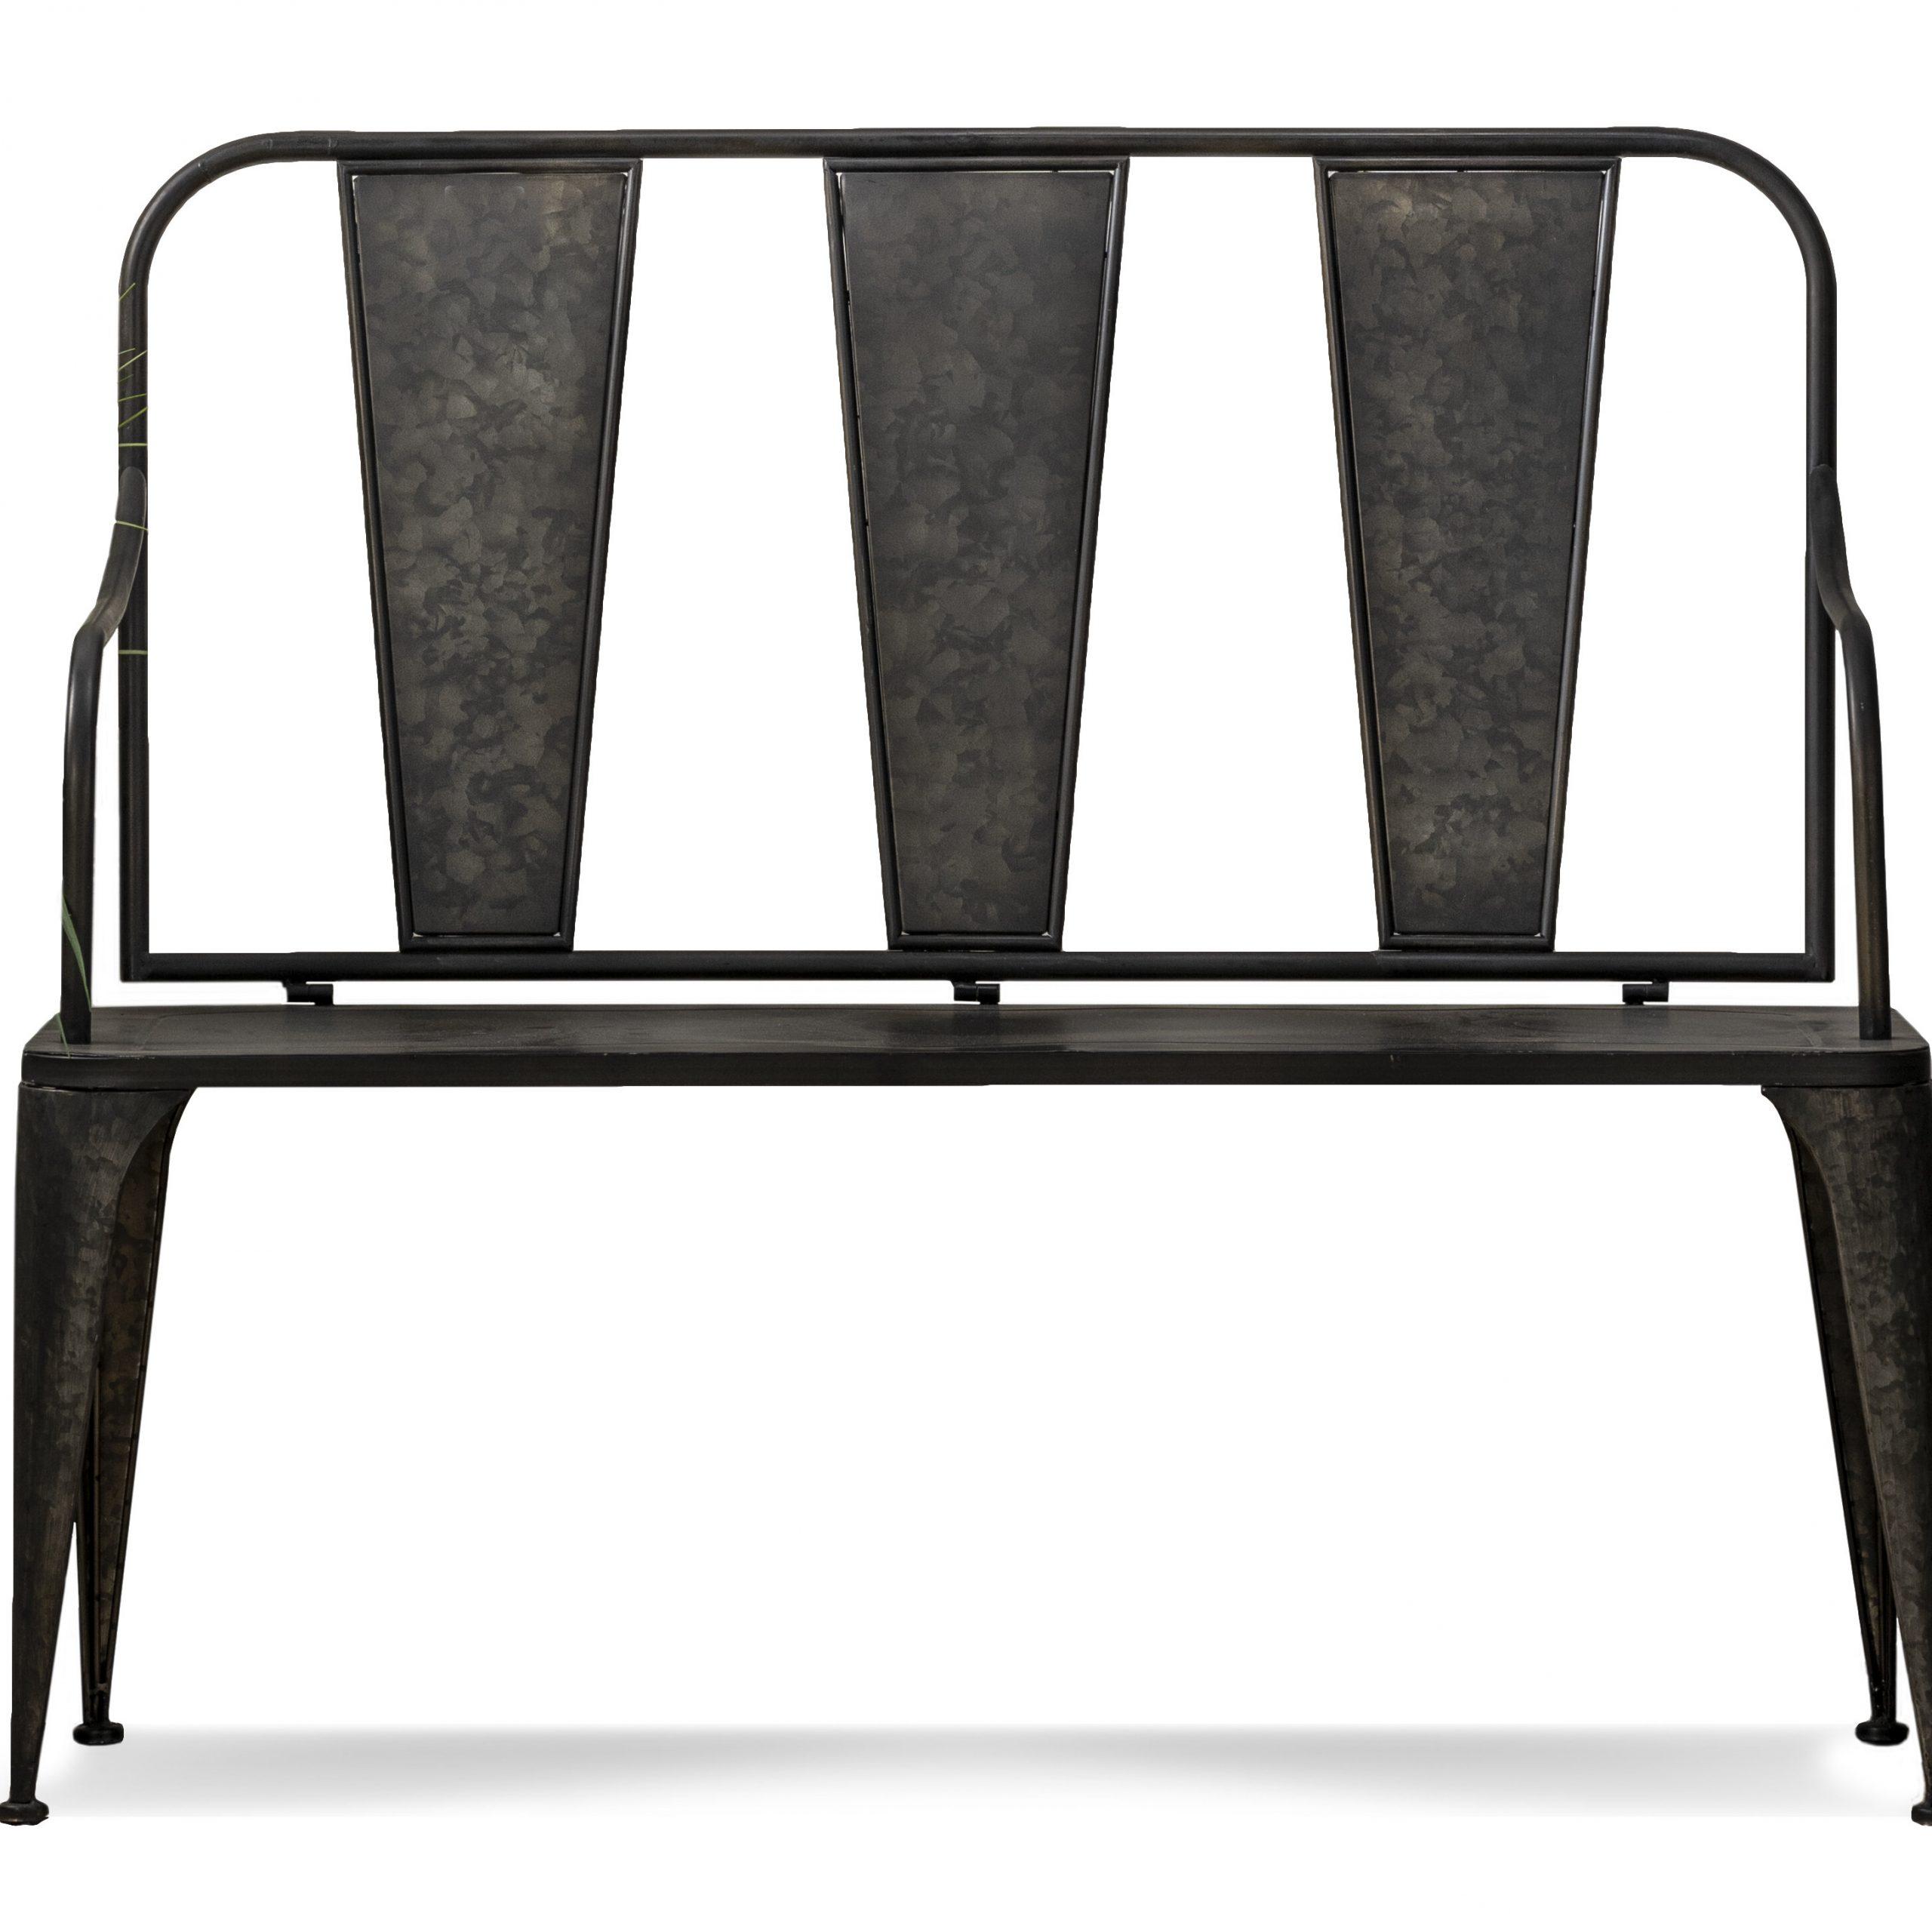 2020 Norrie Metal Garden Benches For Lorsworth Iron Garden Bench (View 2 of 30)